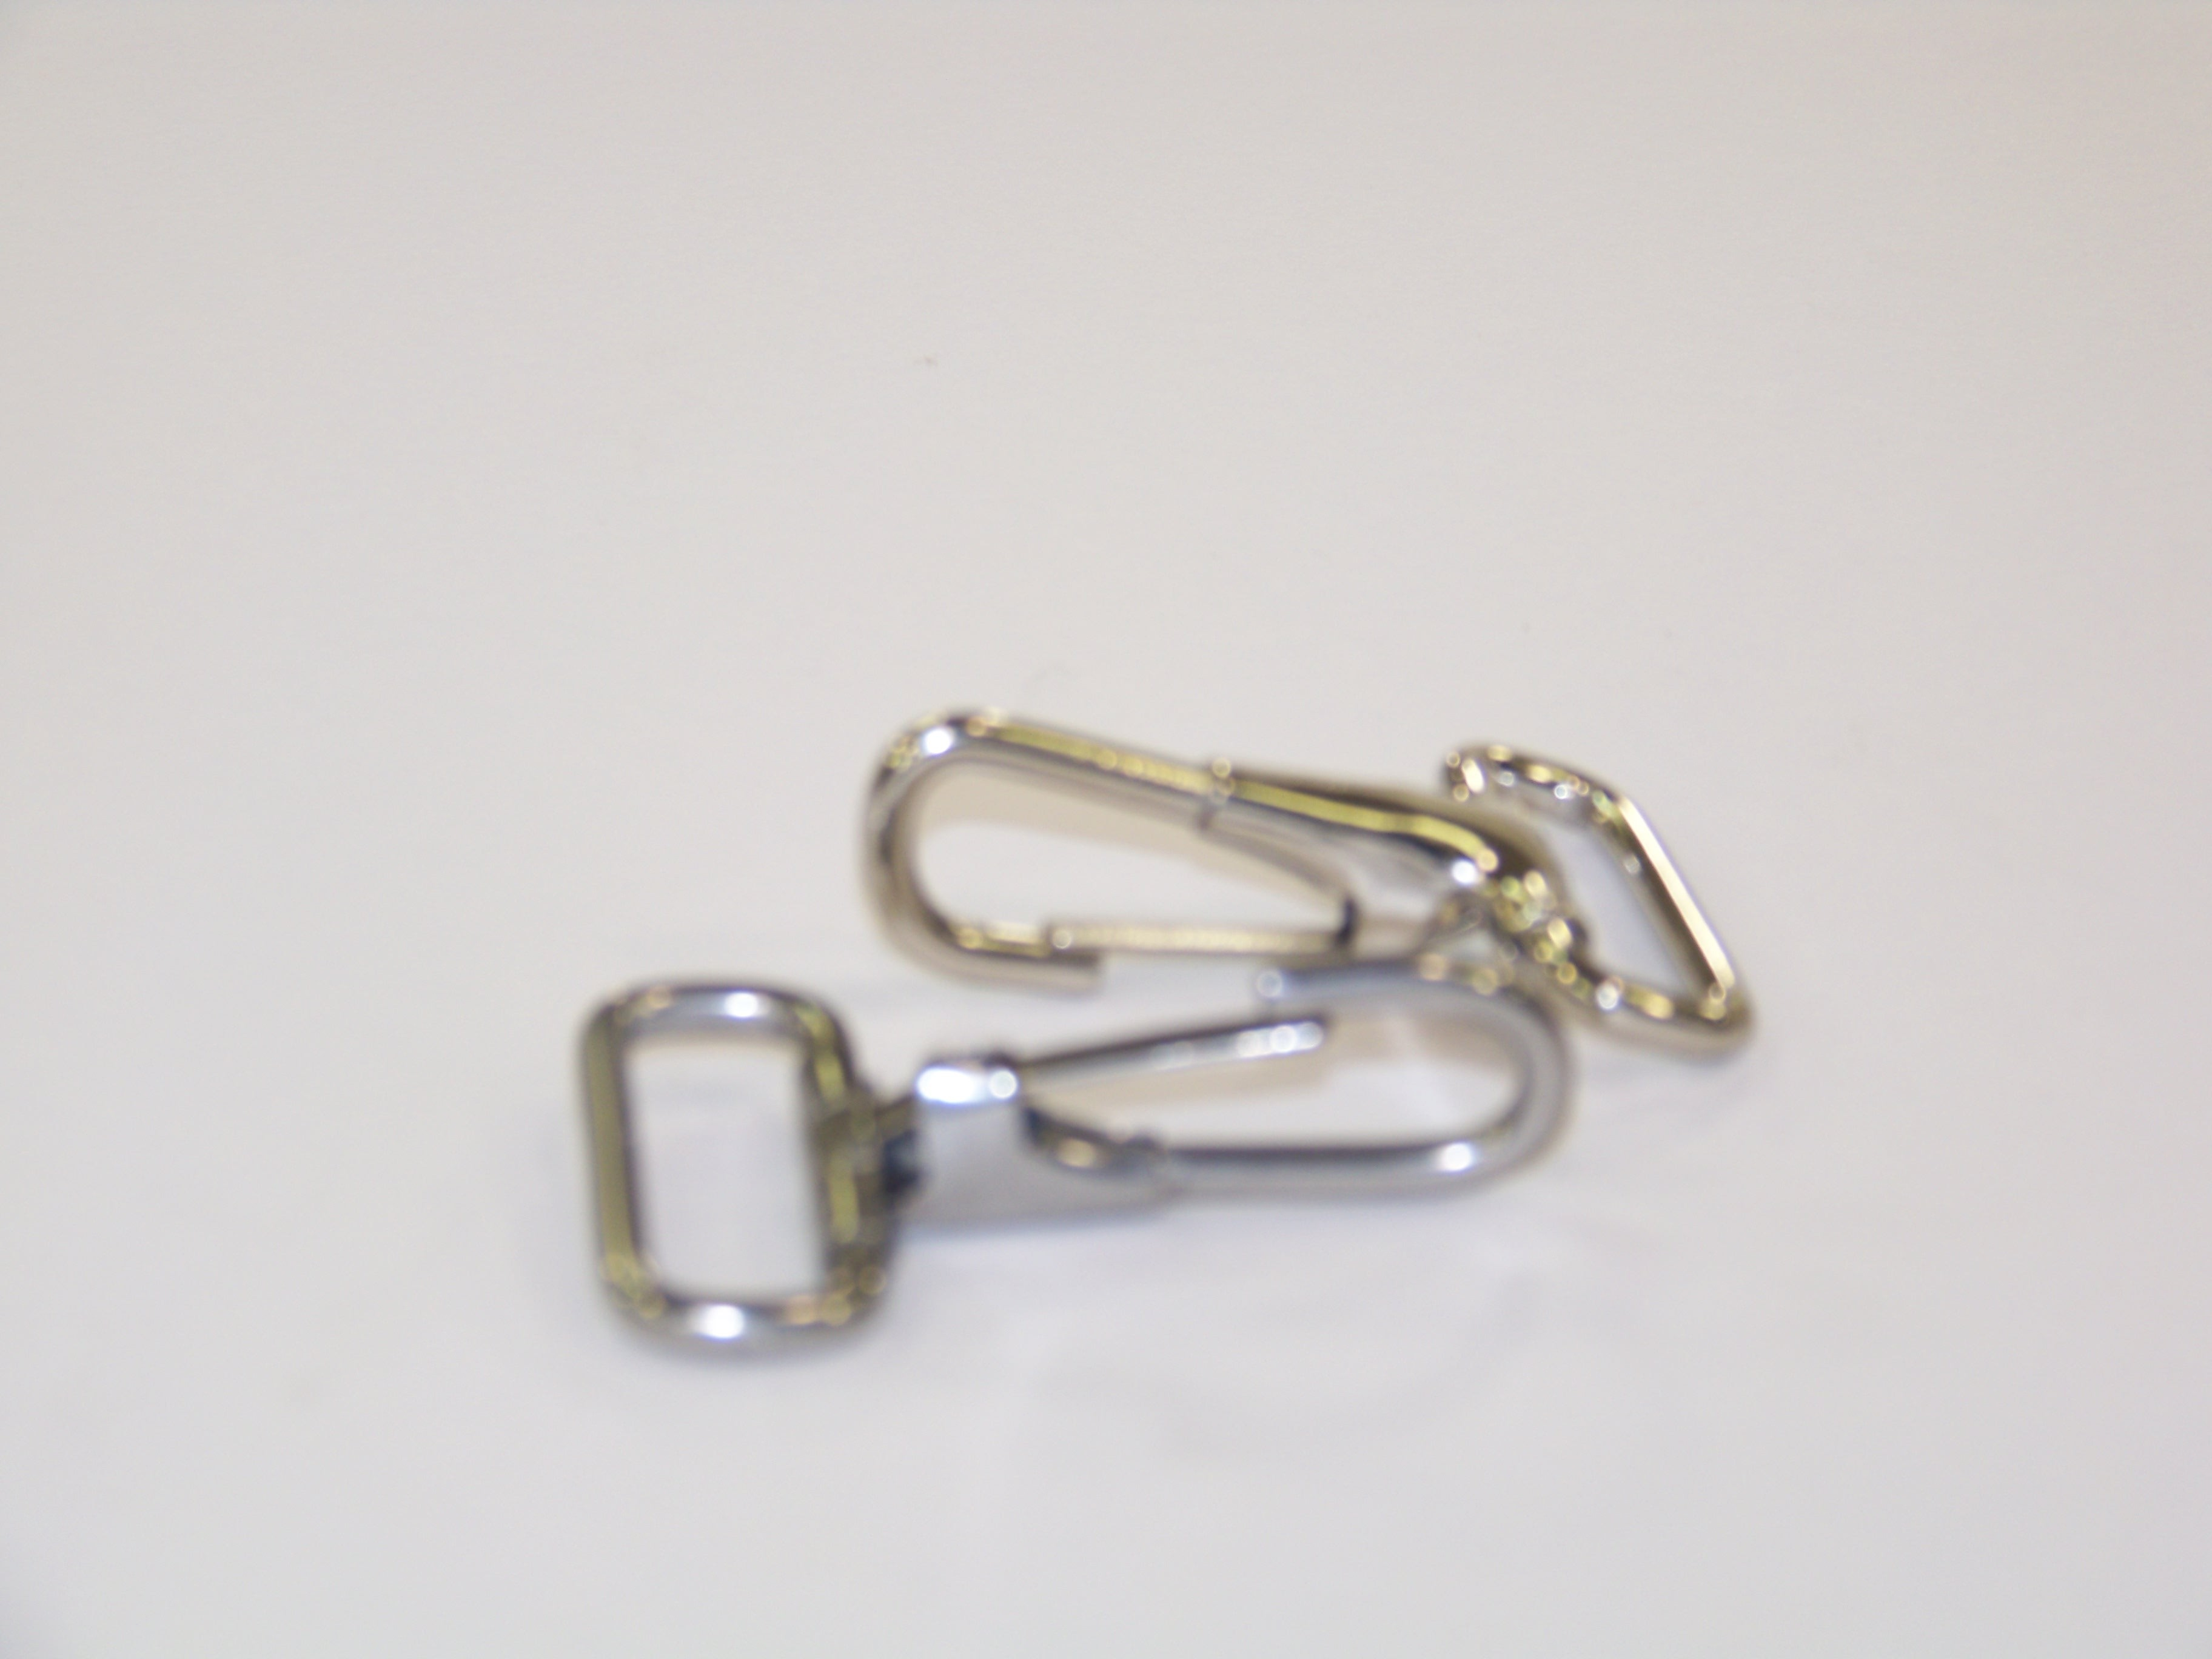 bimini clips